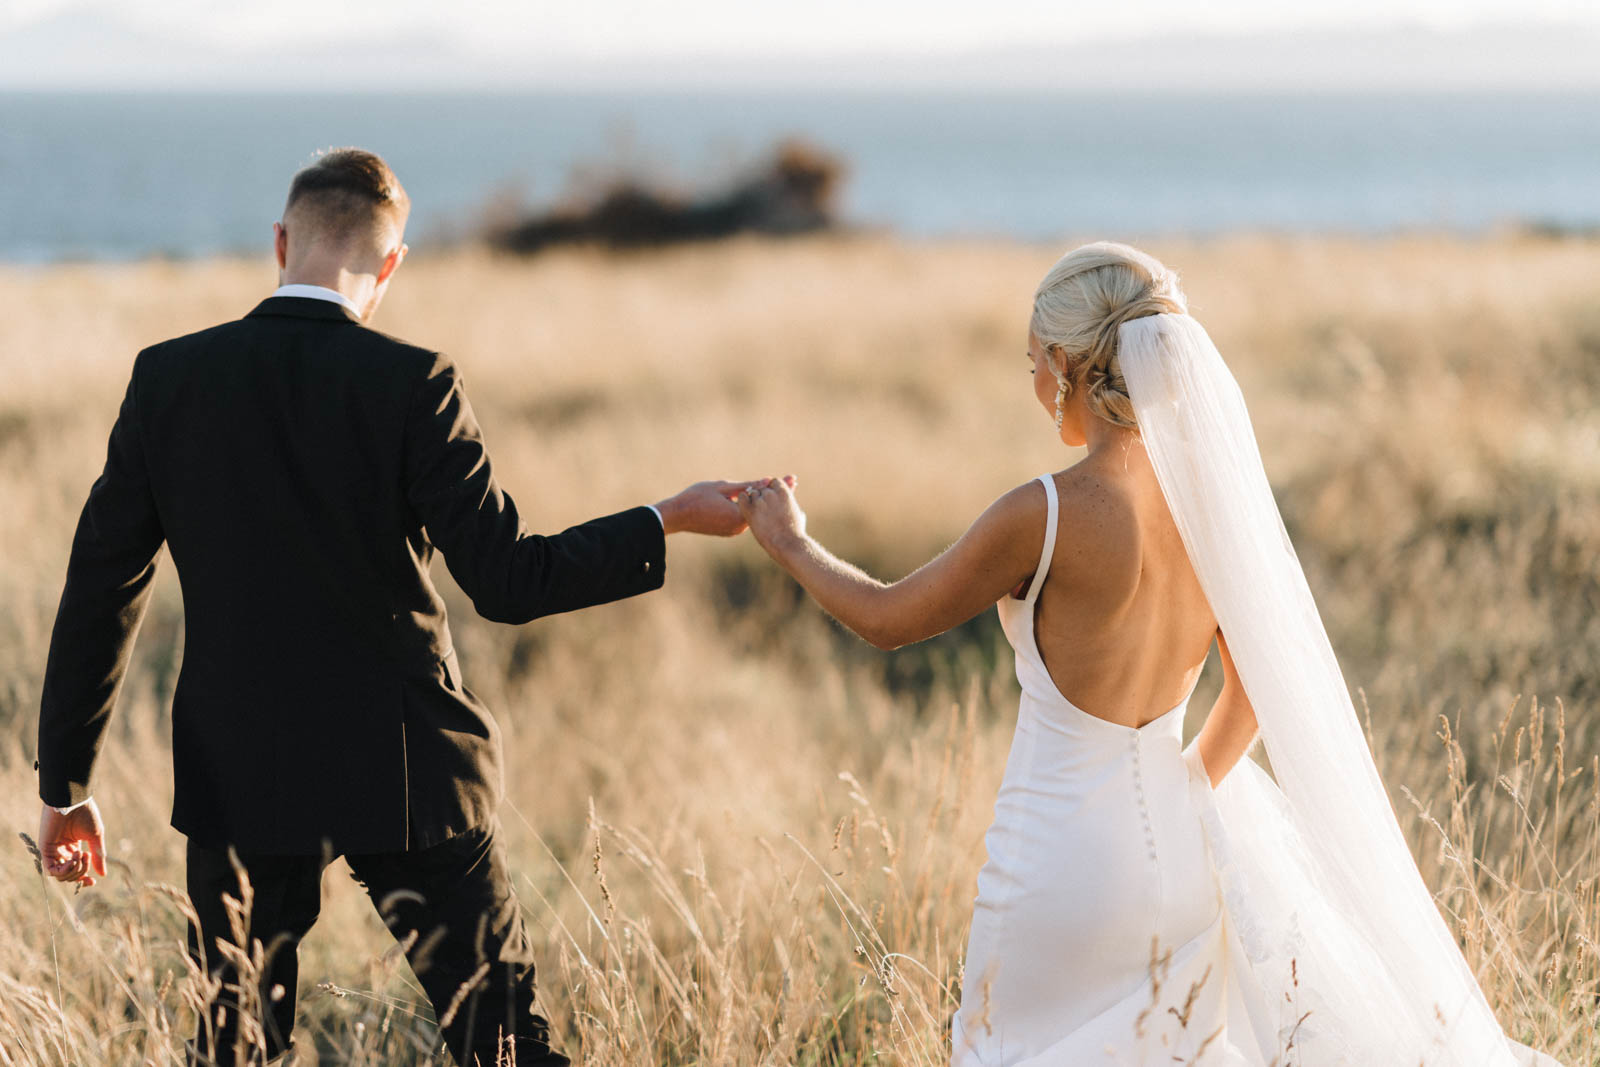 newfound-k-s-hilton-taupo-wedding-photographer-060